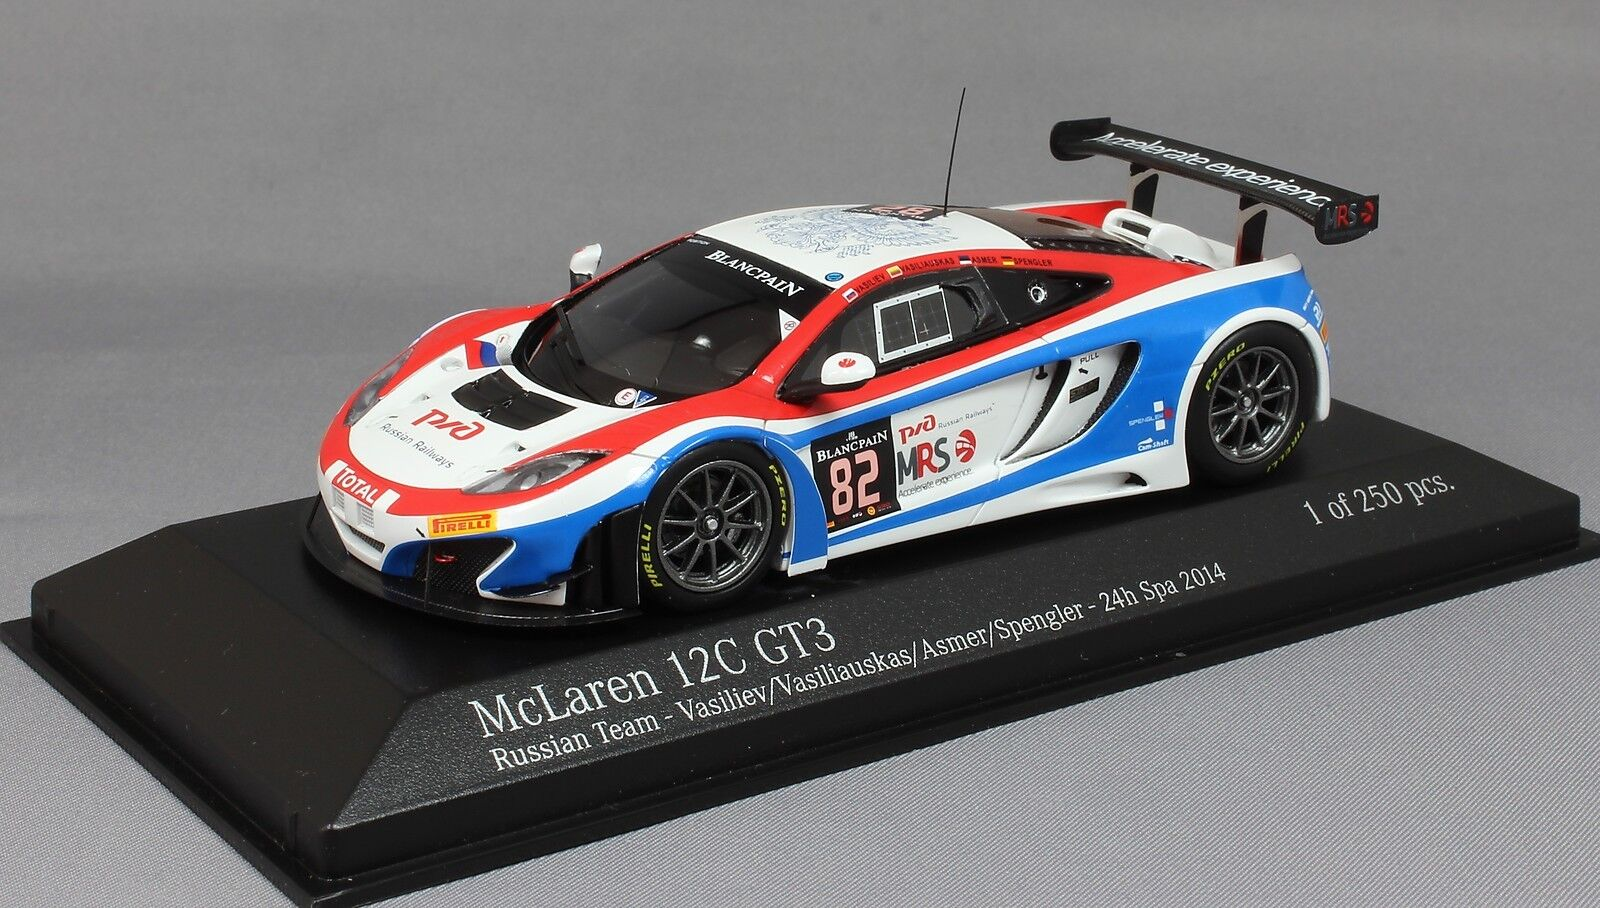 Minichamps McLaren 12 C GT3 SPA 14 Vasilyev Asmer Vasiliauskas Vasiliauskas Vasiliauskas Spengler 437141382 6dfdd7